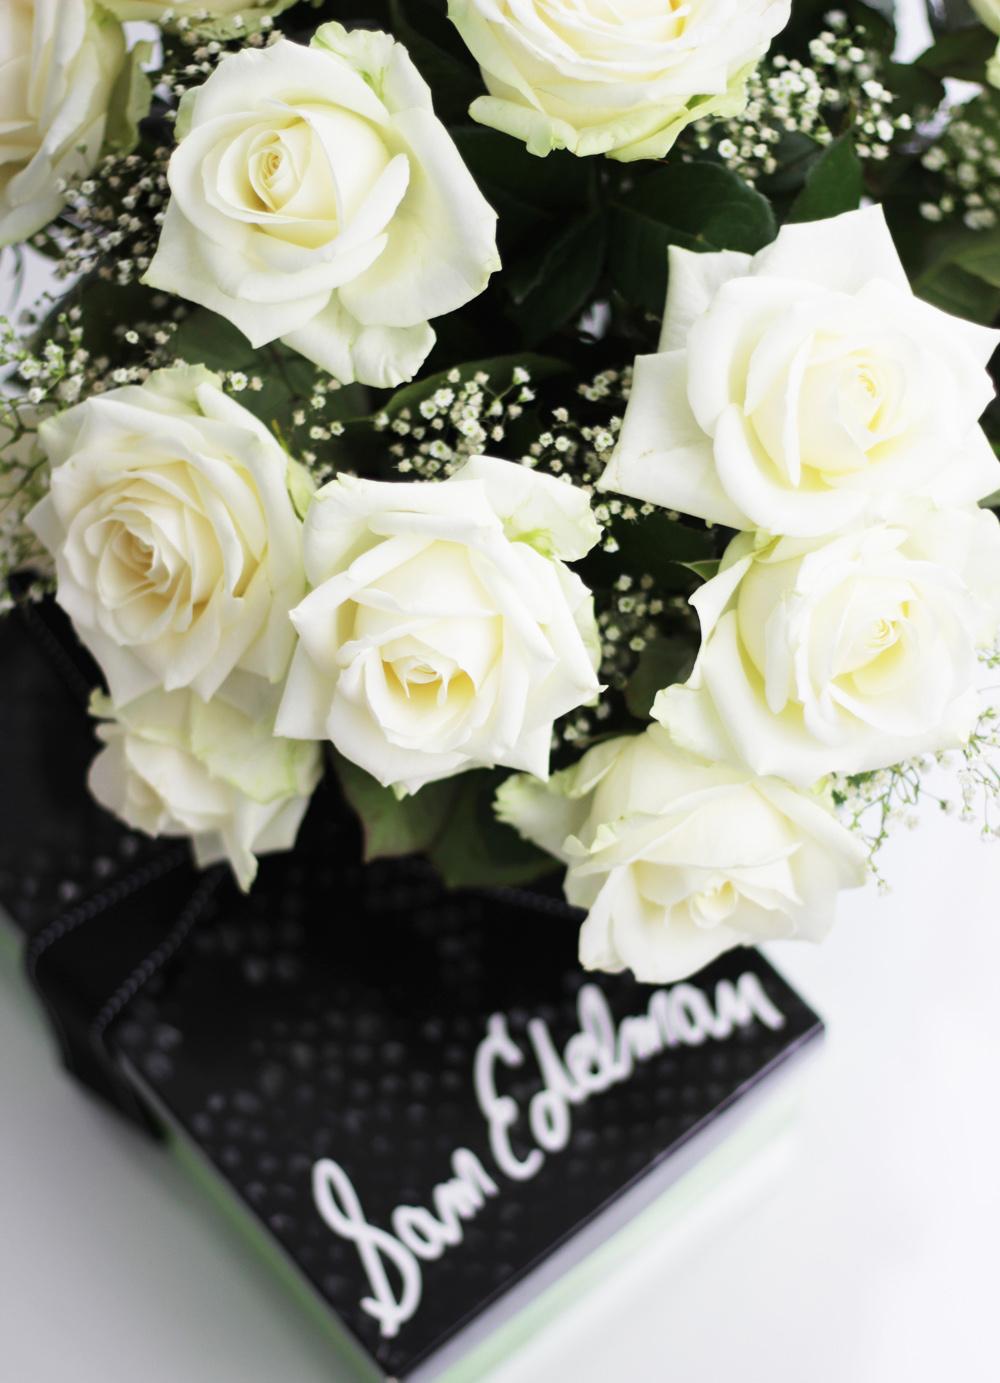 fatimayarie-samedelman-netaporter-whiteroses-flowerbouquet-styleblog-img_5328